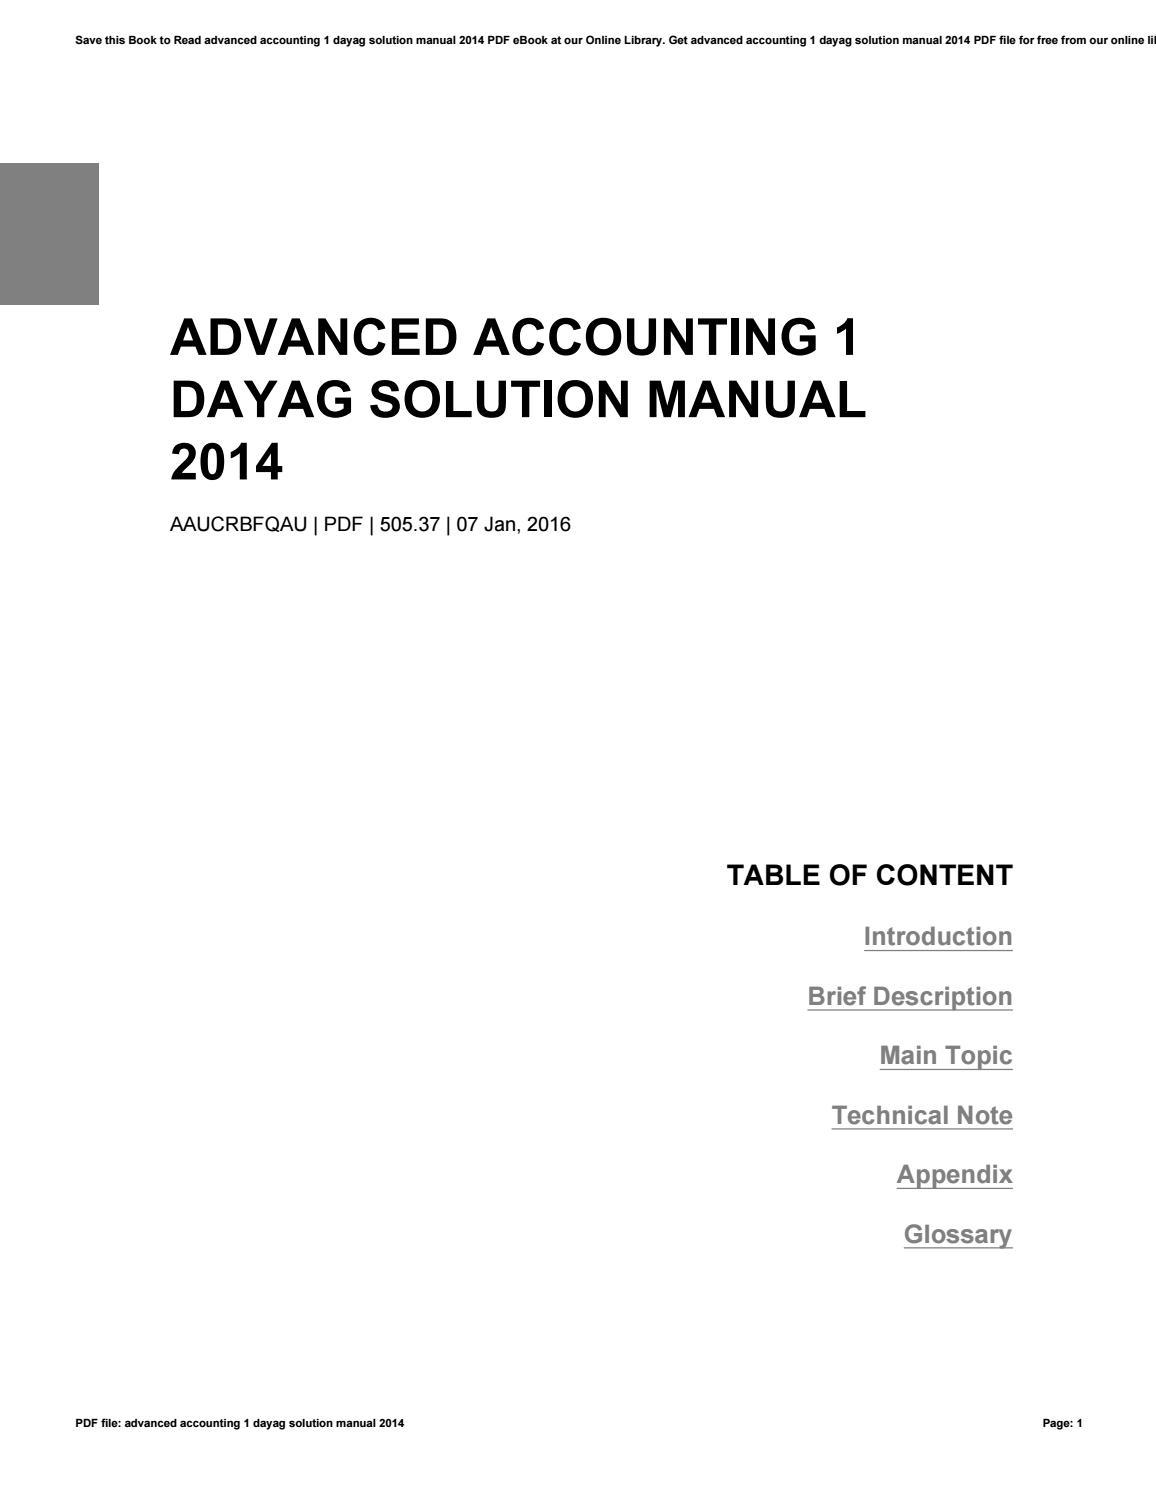 Advanced accounting 1 dayag solution manual 2014 by StevenKendrick1440 -  issuu